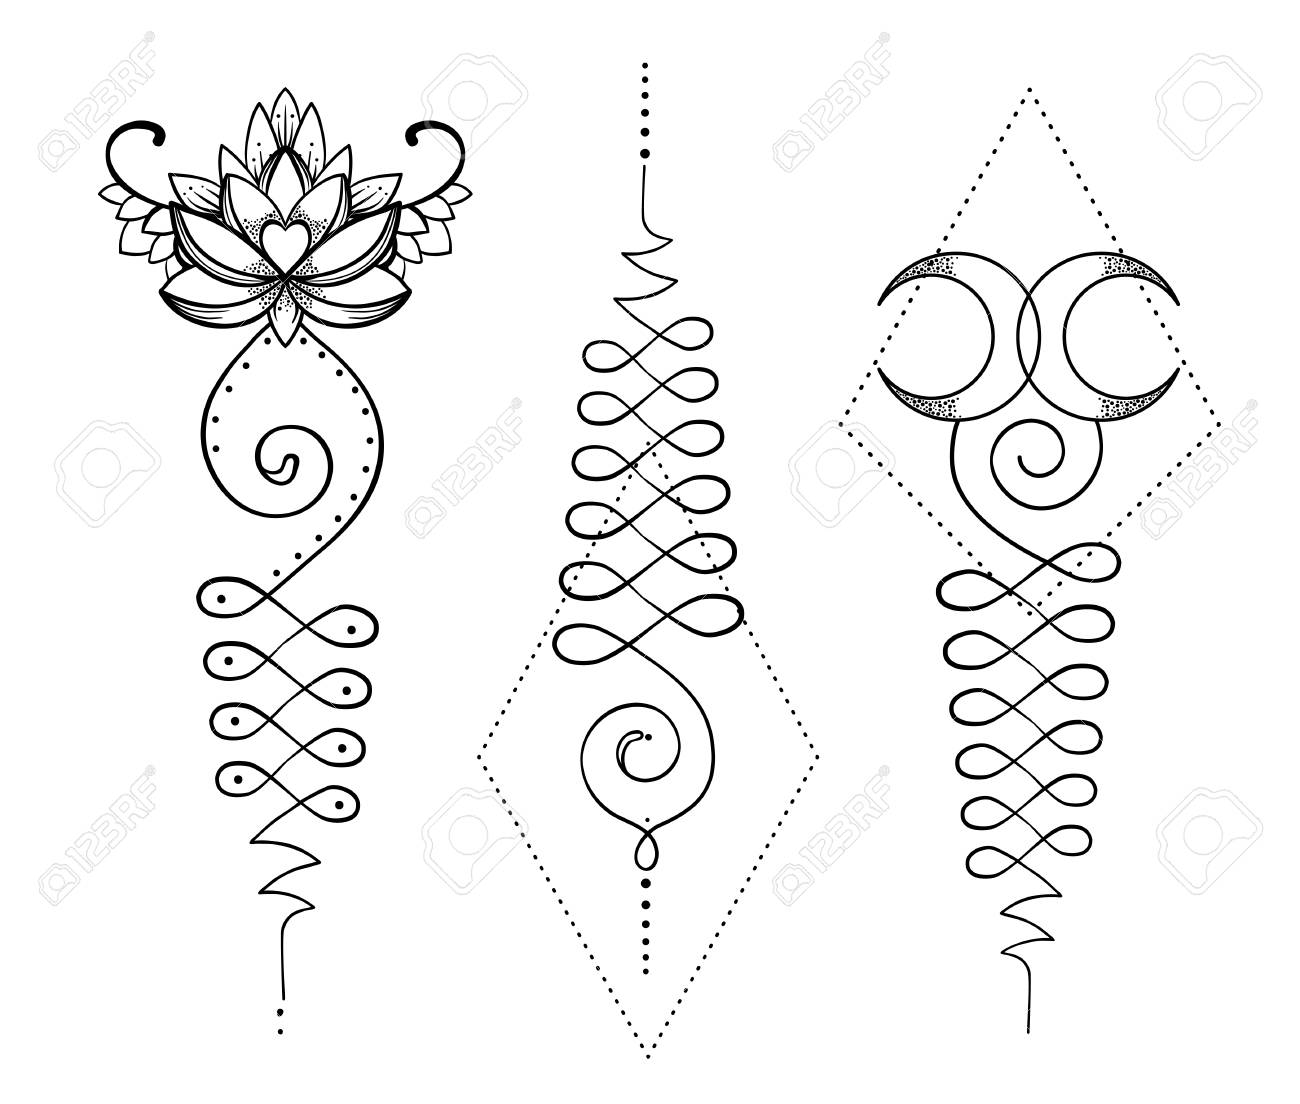 Lotus and sacred geometry unamole hindu symbol of wisdom and path unamole hindu symbol of wisdom and path to perfection set buycottarizona